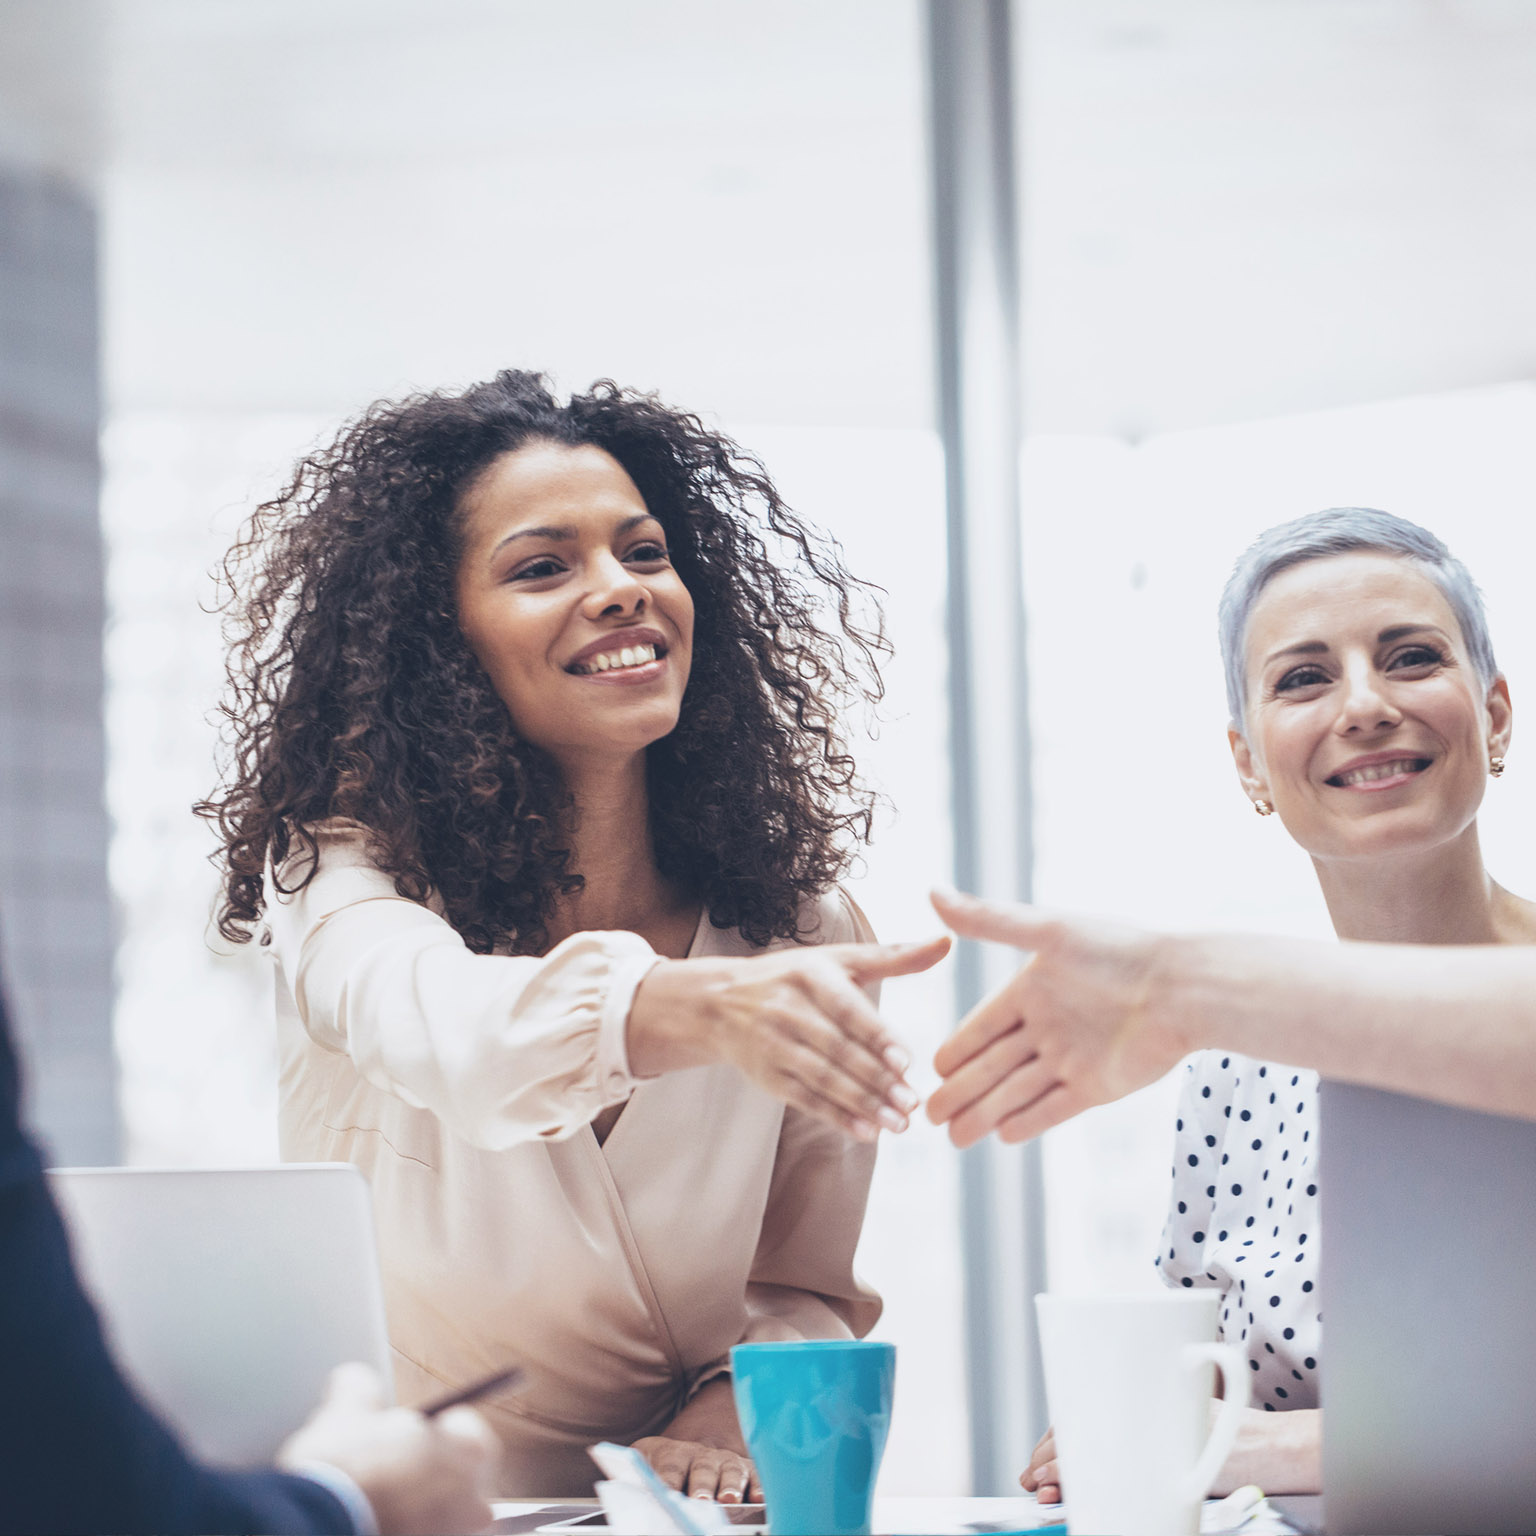 QnA VBage 'Power partnerships': Manufacturer–retailer collaborations that work